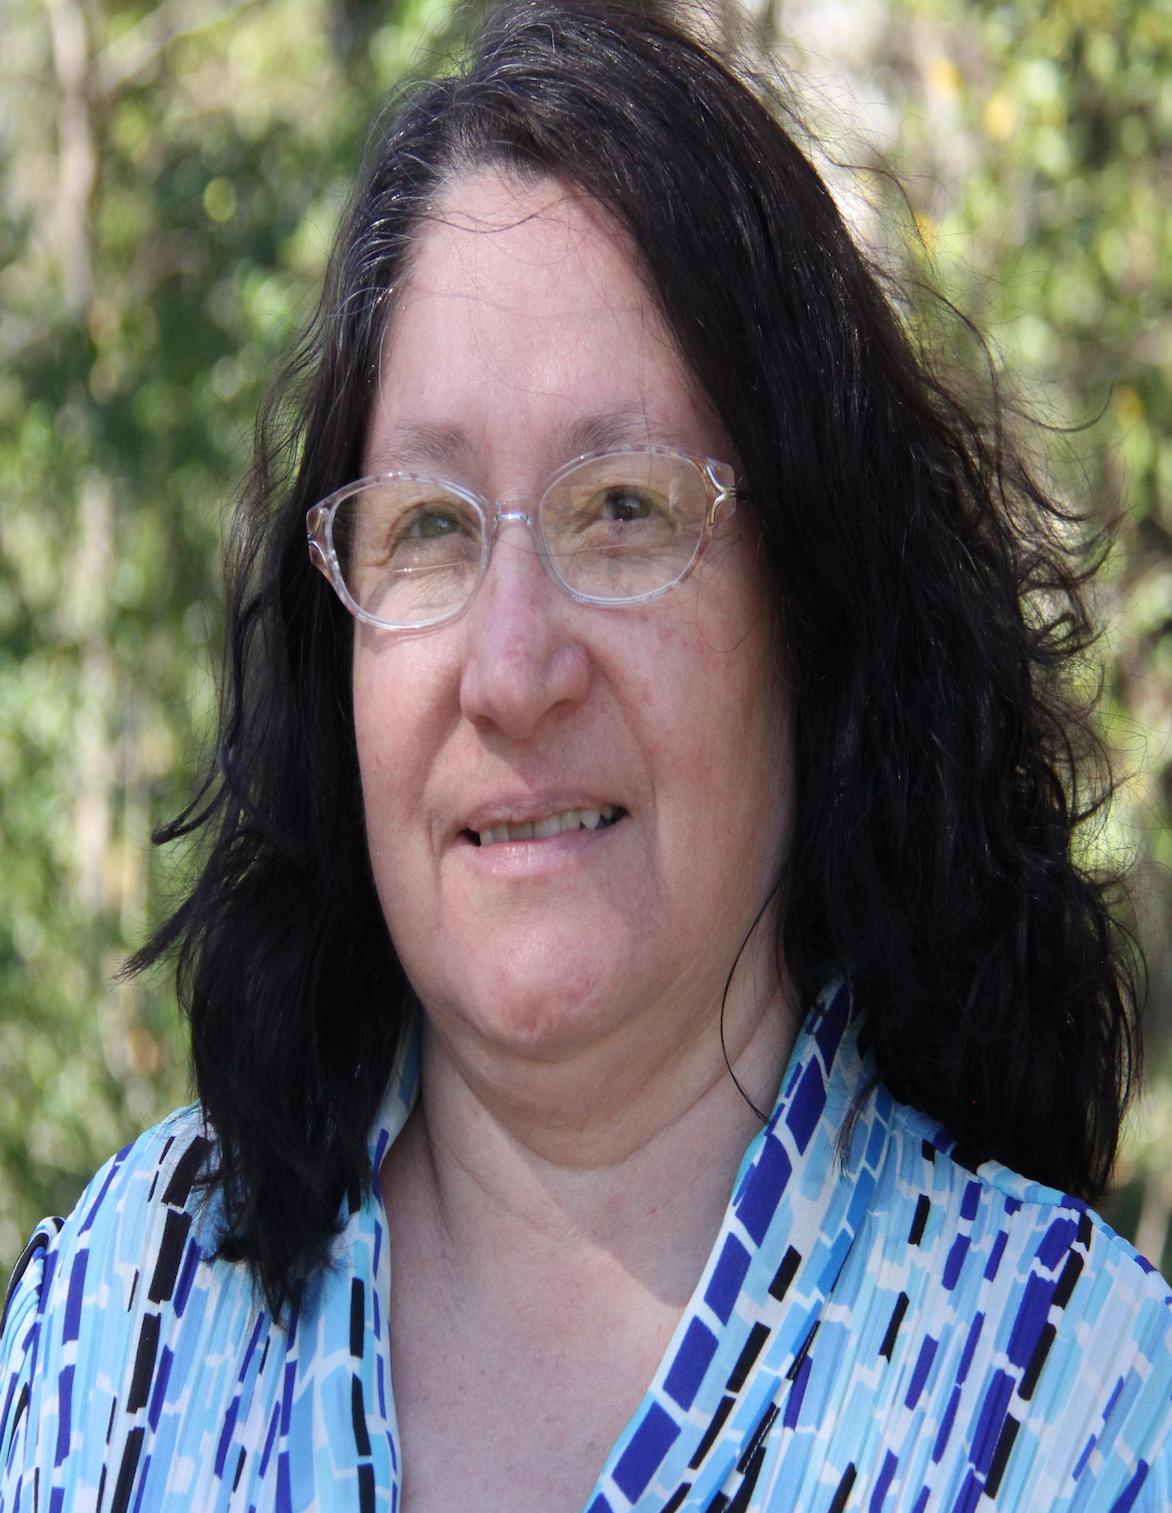 Sandra Docarmo